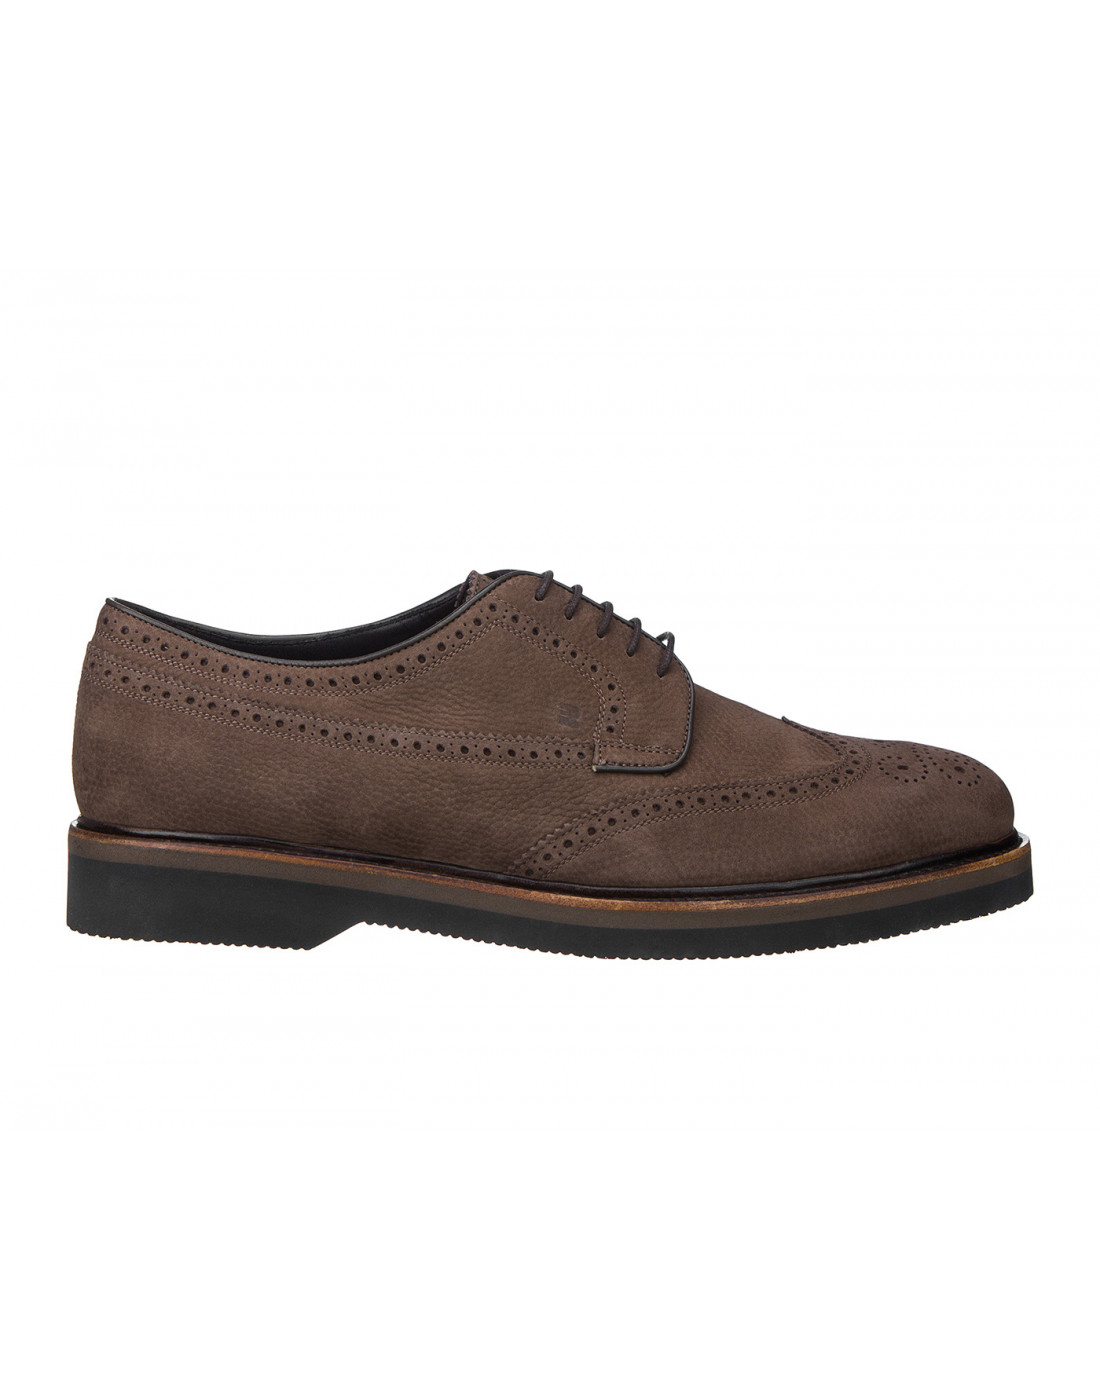 Туфли бежевые мужские Fratelli Rossetti S45900-1